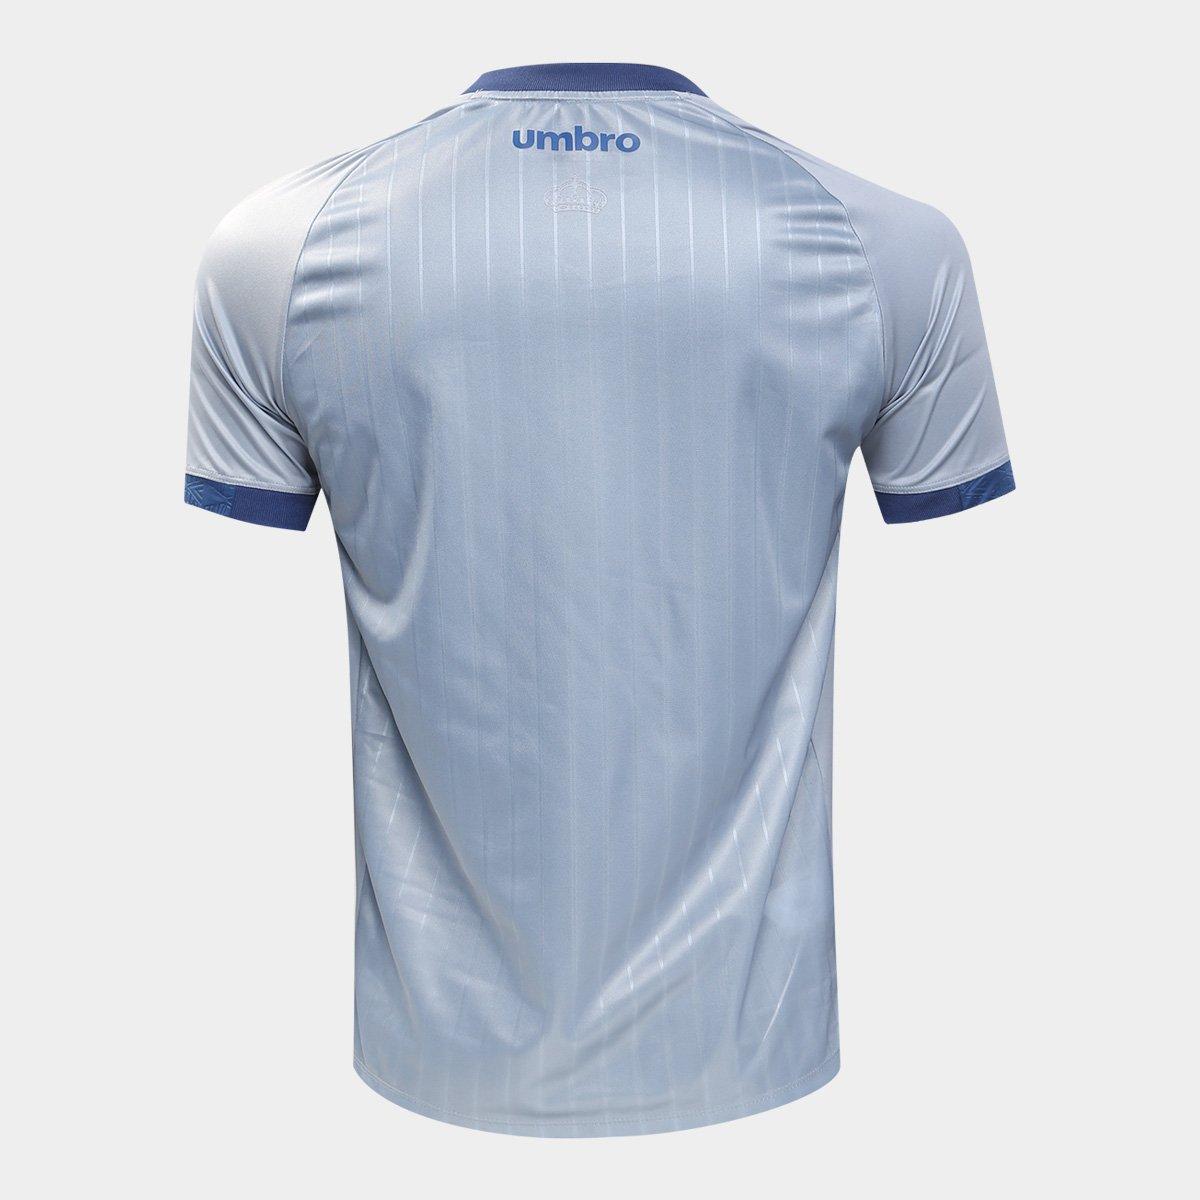 Camisa Cruzeiro III 18/19 s/n - Torcedor Umbro Masculina - Tam: GG - 1